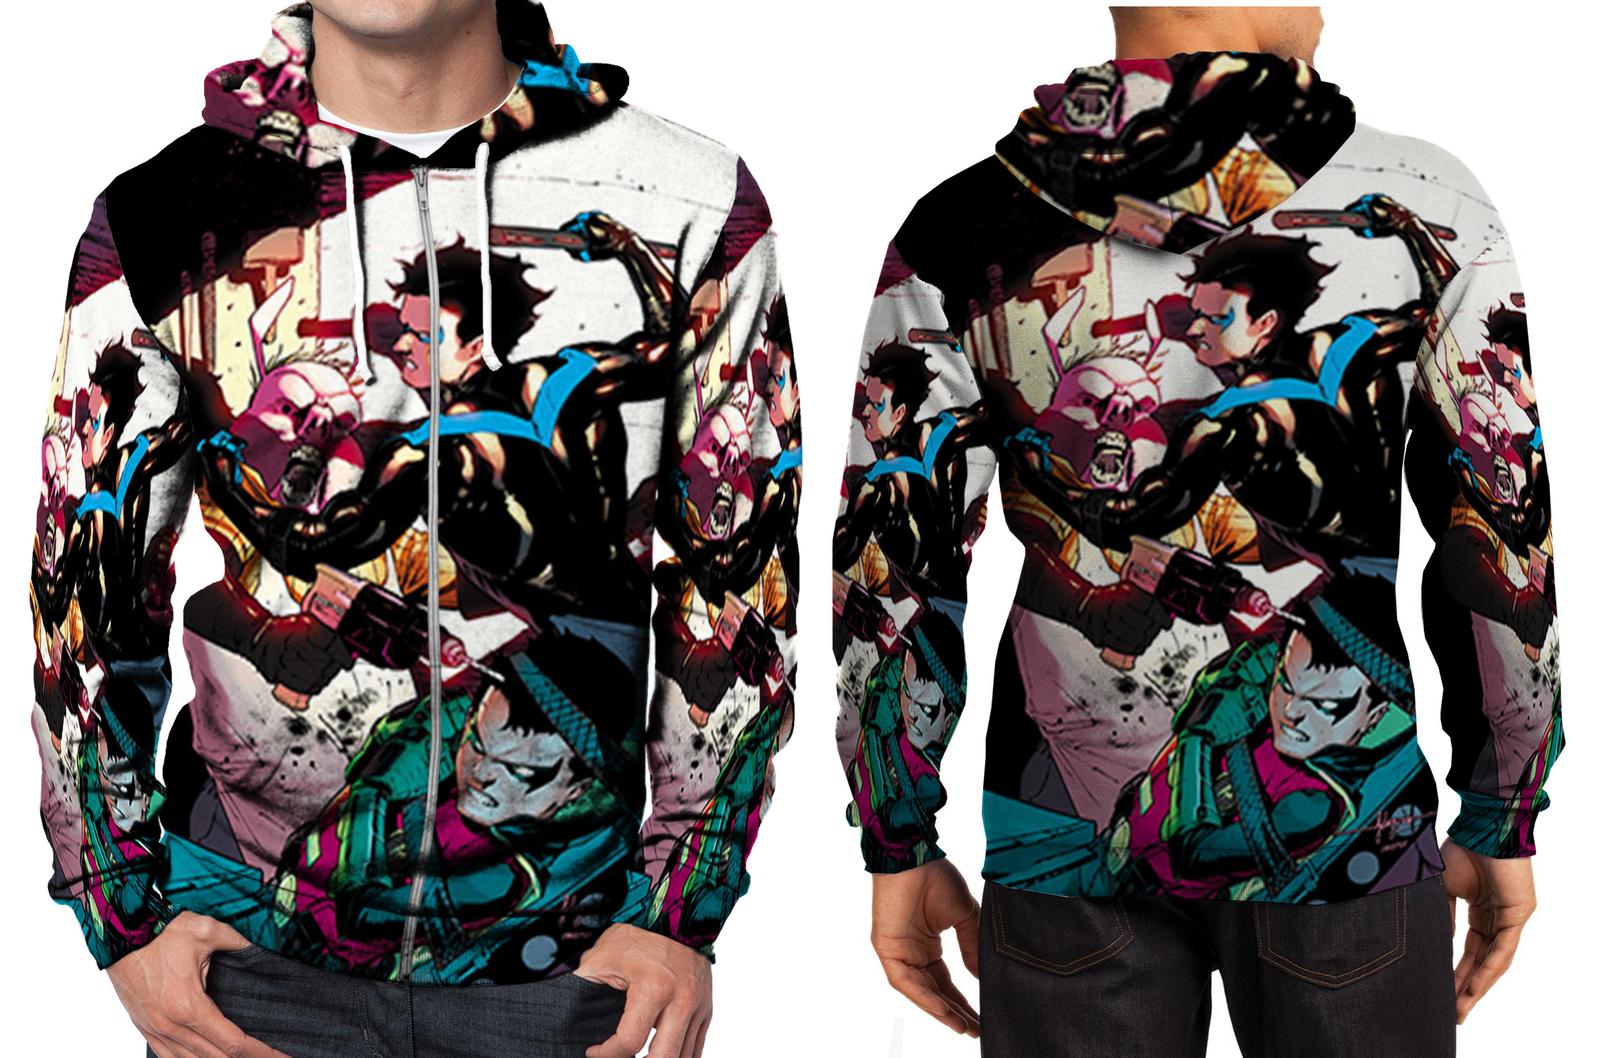 Nightwing fight  zipper hoodie men s